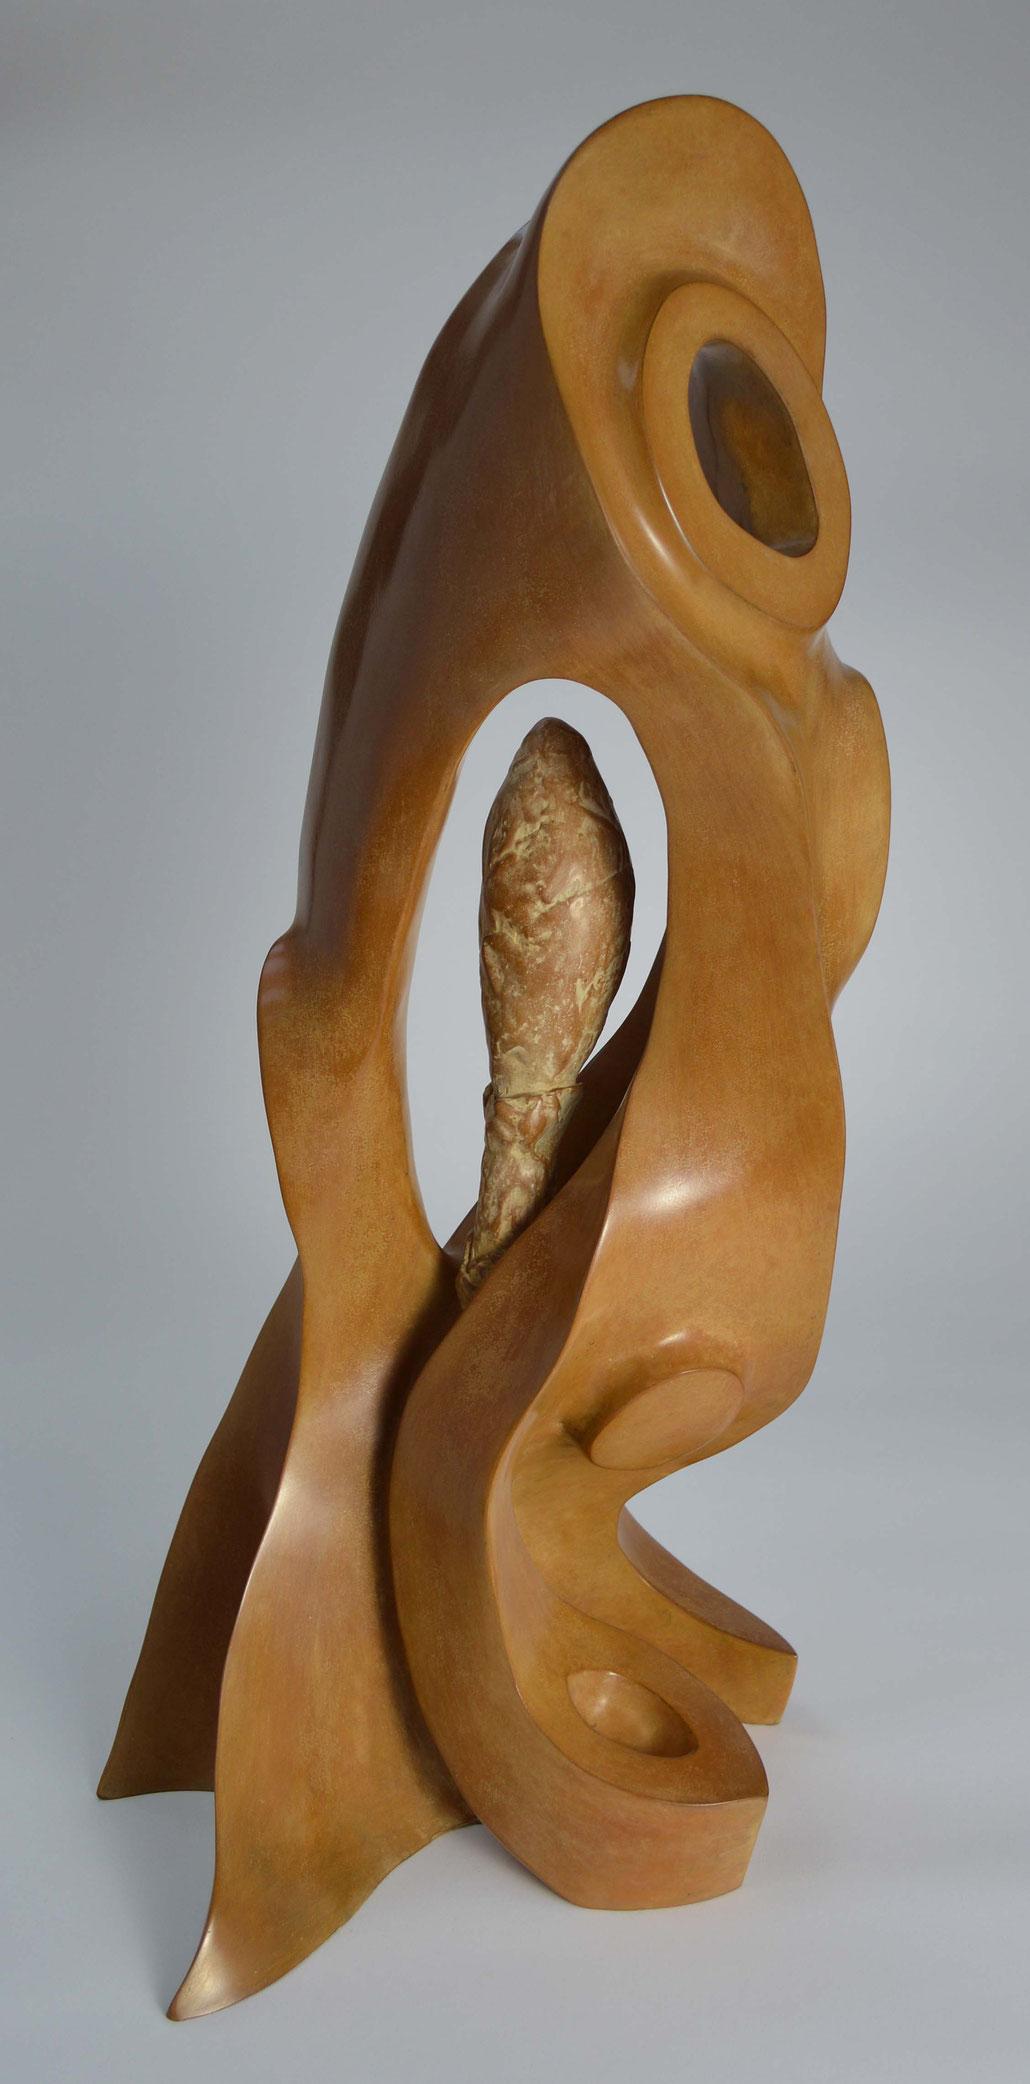 Jenna Romagnolo, Irina Starkova, Laura Walford, Adrian Locke. MASTERPIECE art fair London. Contemporary sculpture by HEX.